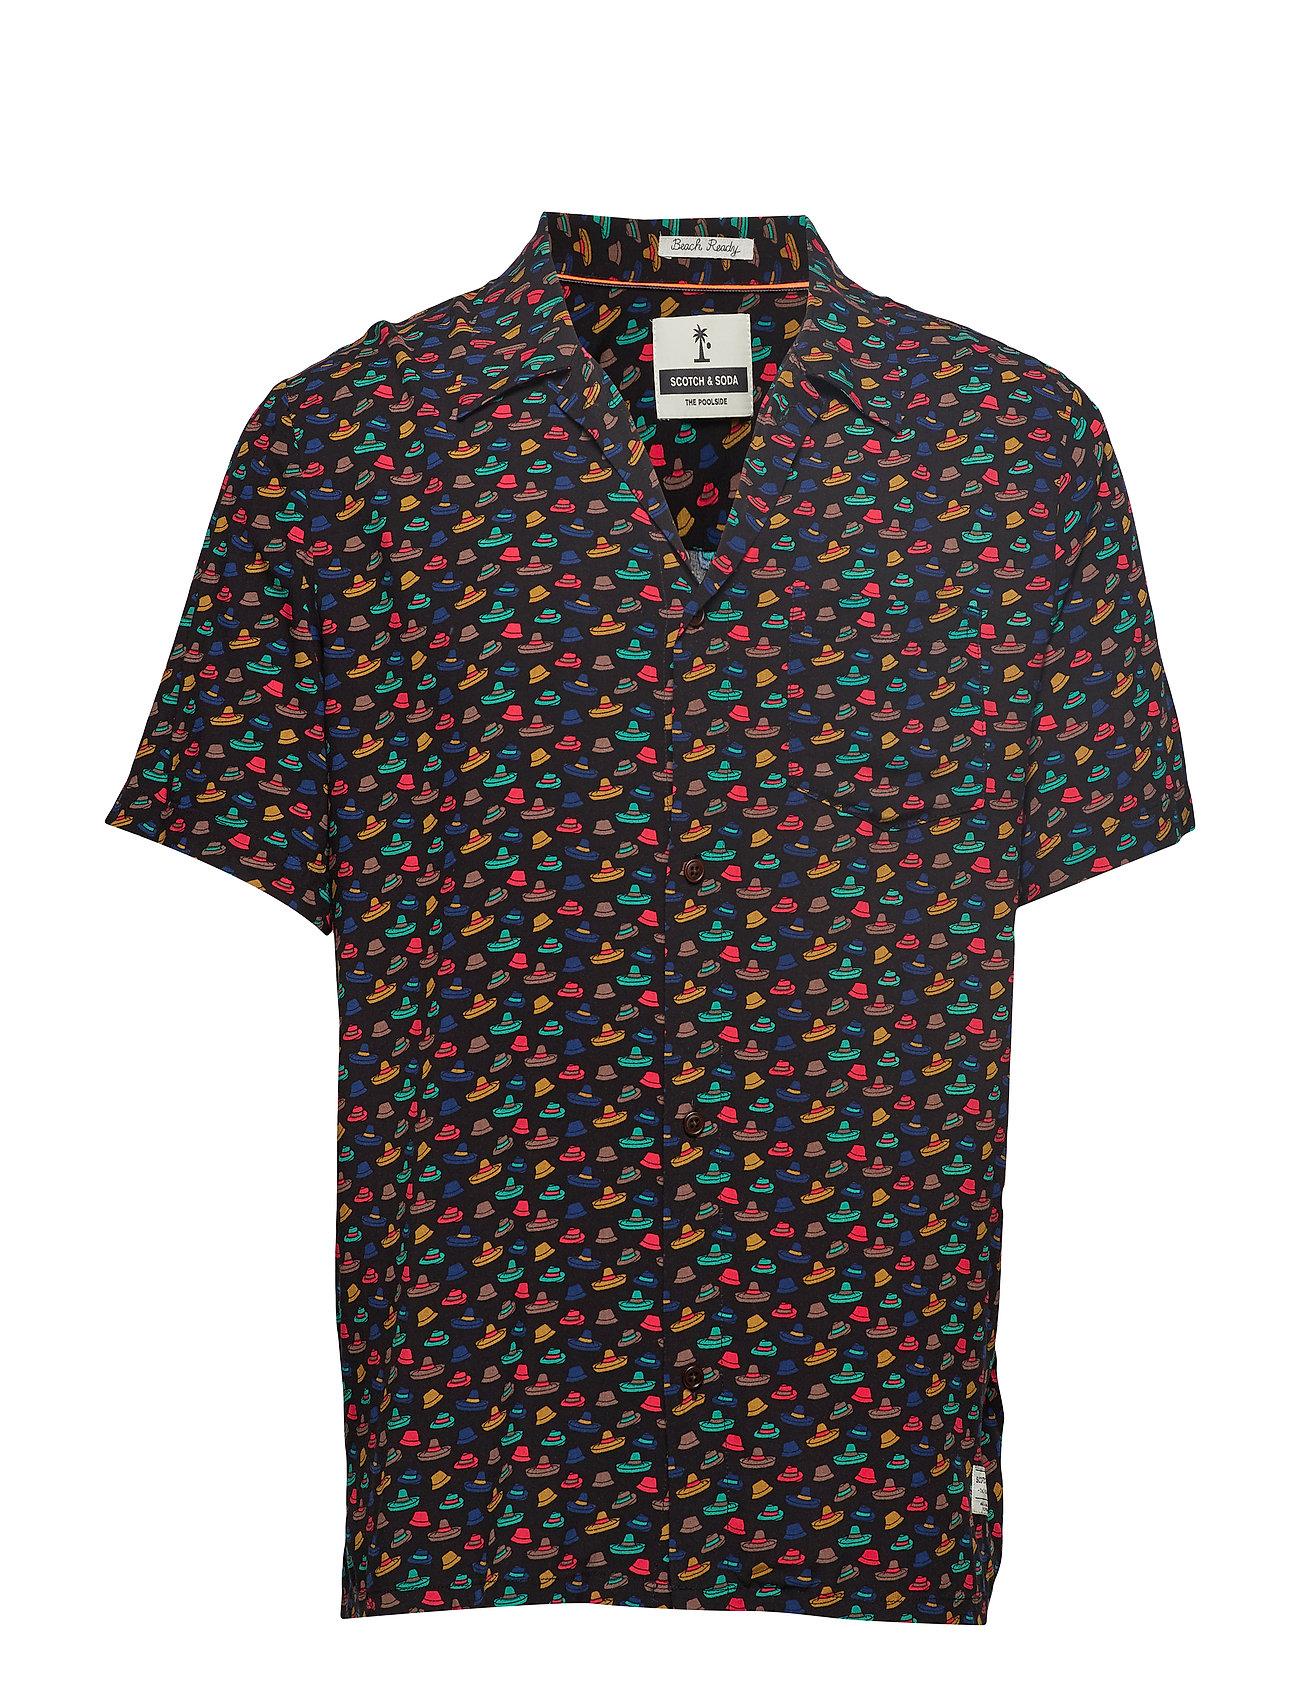 Scotch & Soda HAWAIIAN FIT - Printed shortsleeve shirt - COMBO C